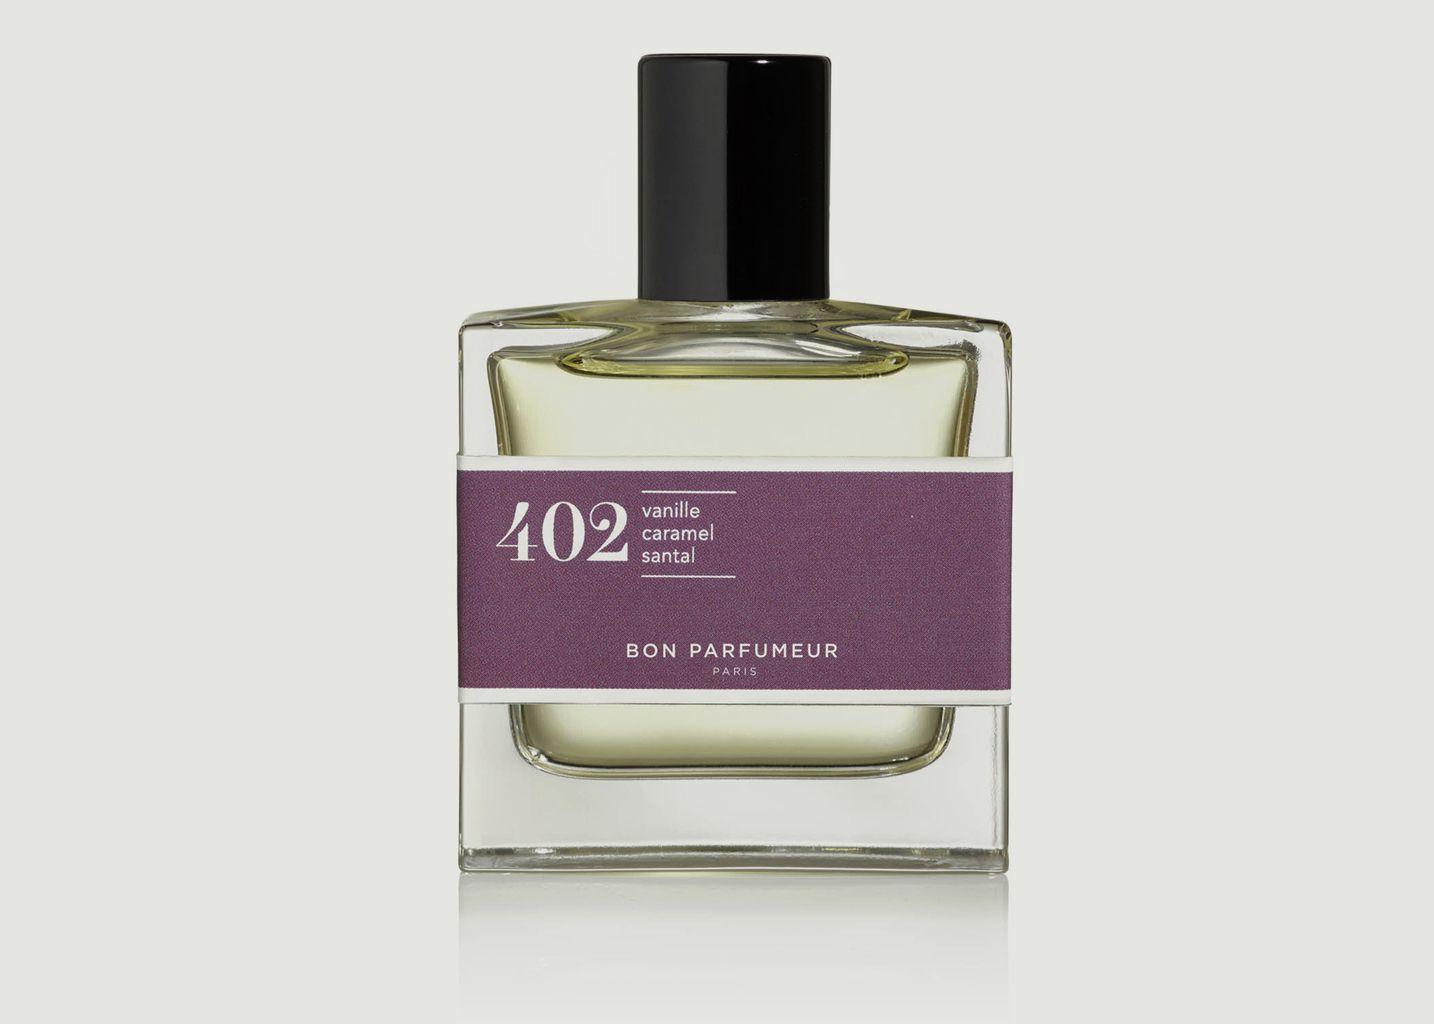 De Vanille Caramel Santal 402 Oriental Eau Parfum lJ1cFK